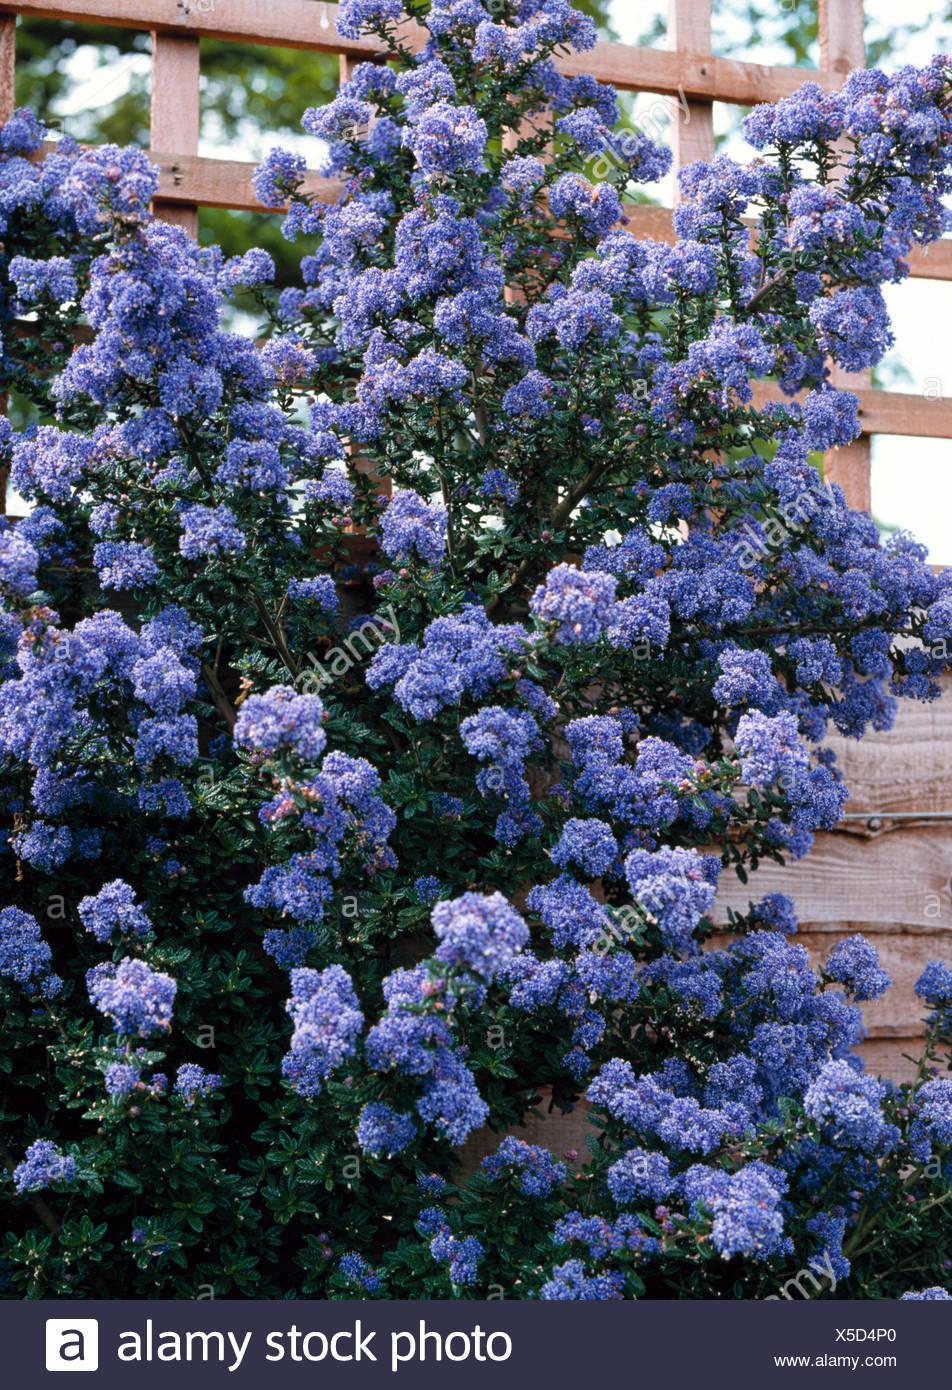 ceanothus blue stock photos ceanothus blue stock images. Black Bedroom Furniture Sets. Home Design Ideas